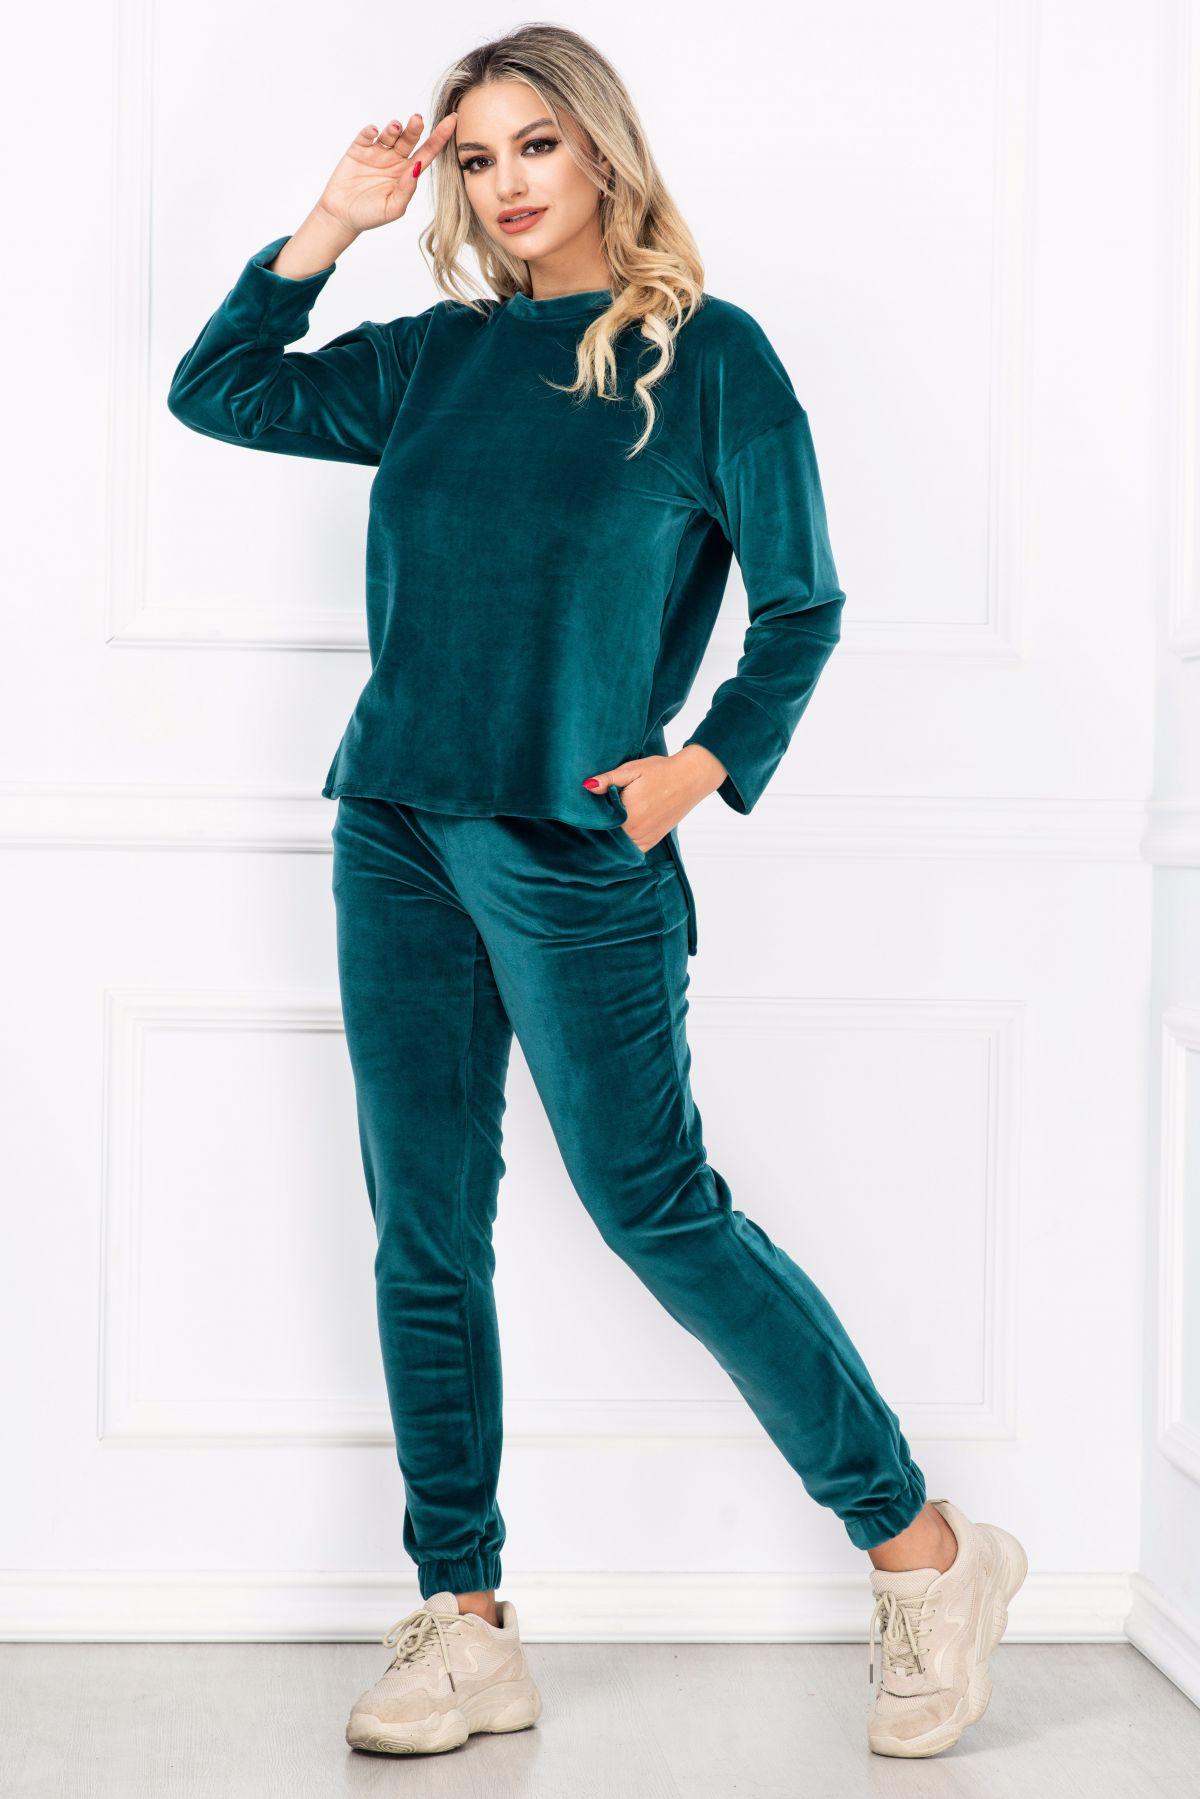 Trening dama din catifea Amelia verde smarald asimetric By InPuff